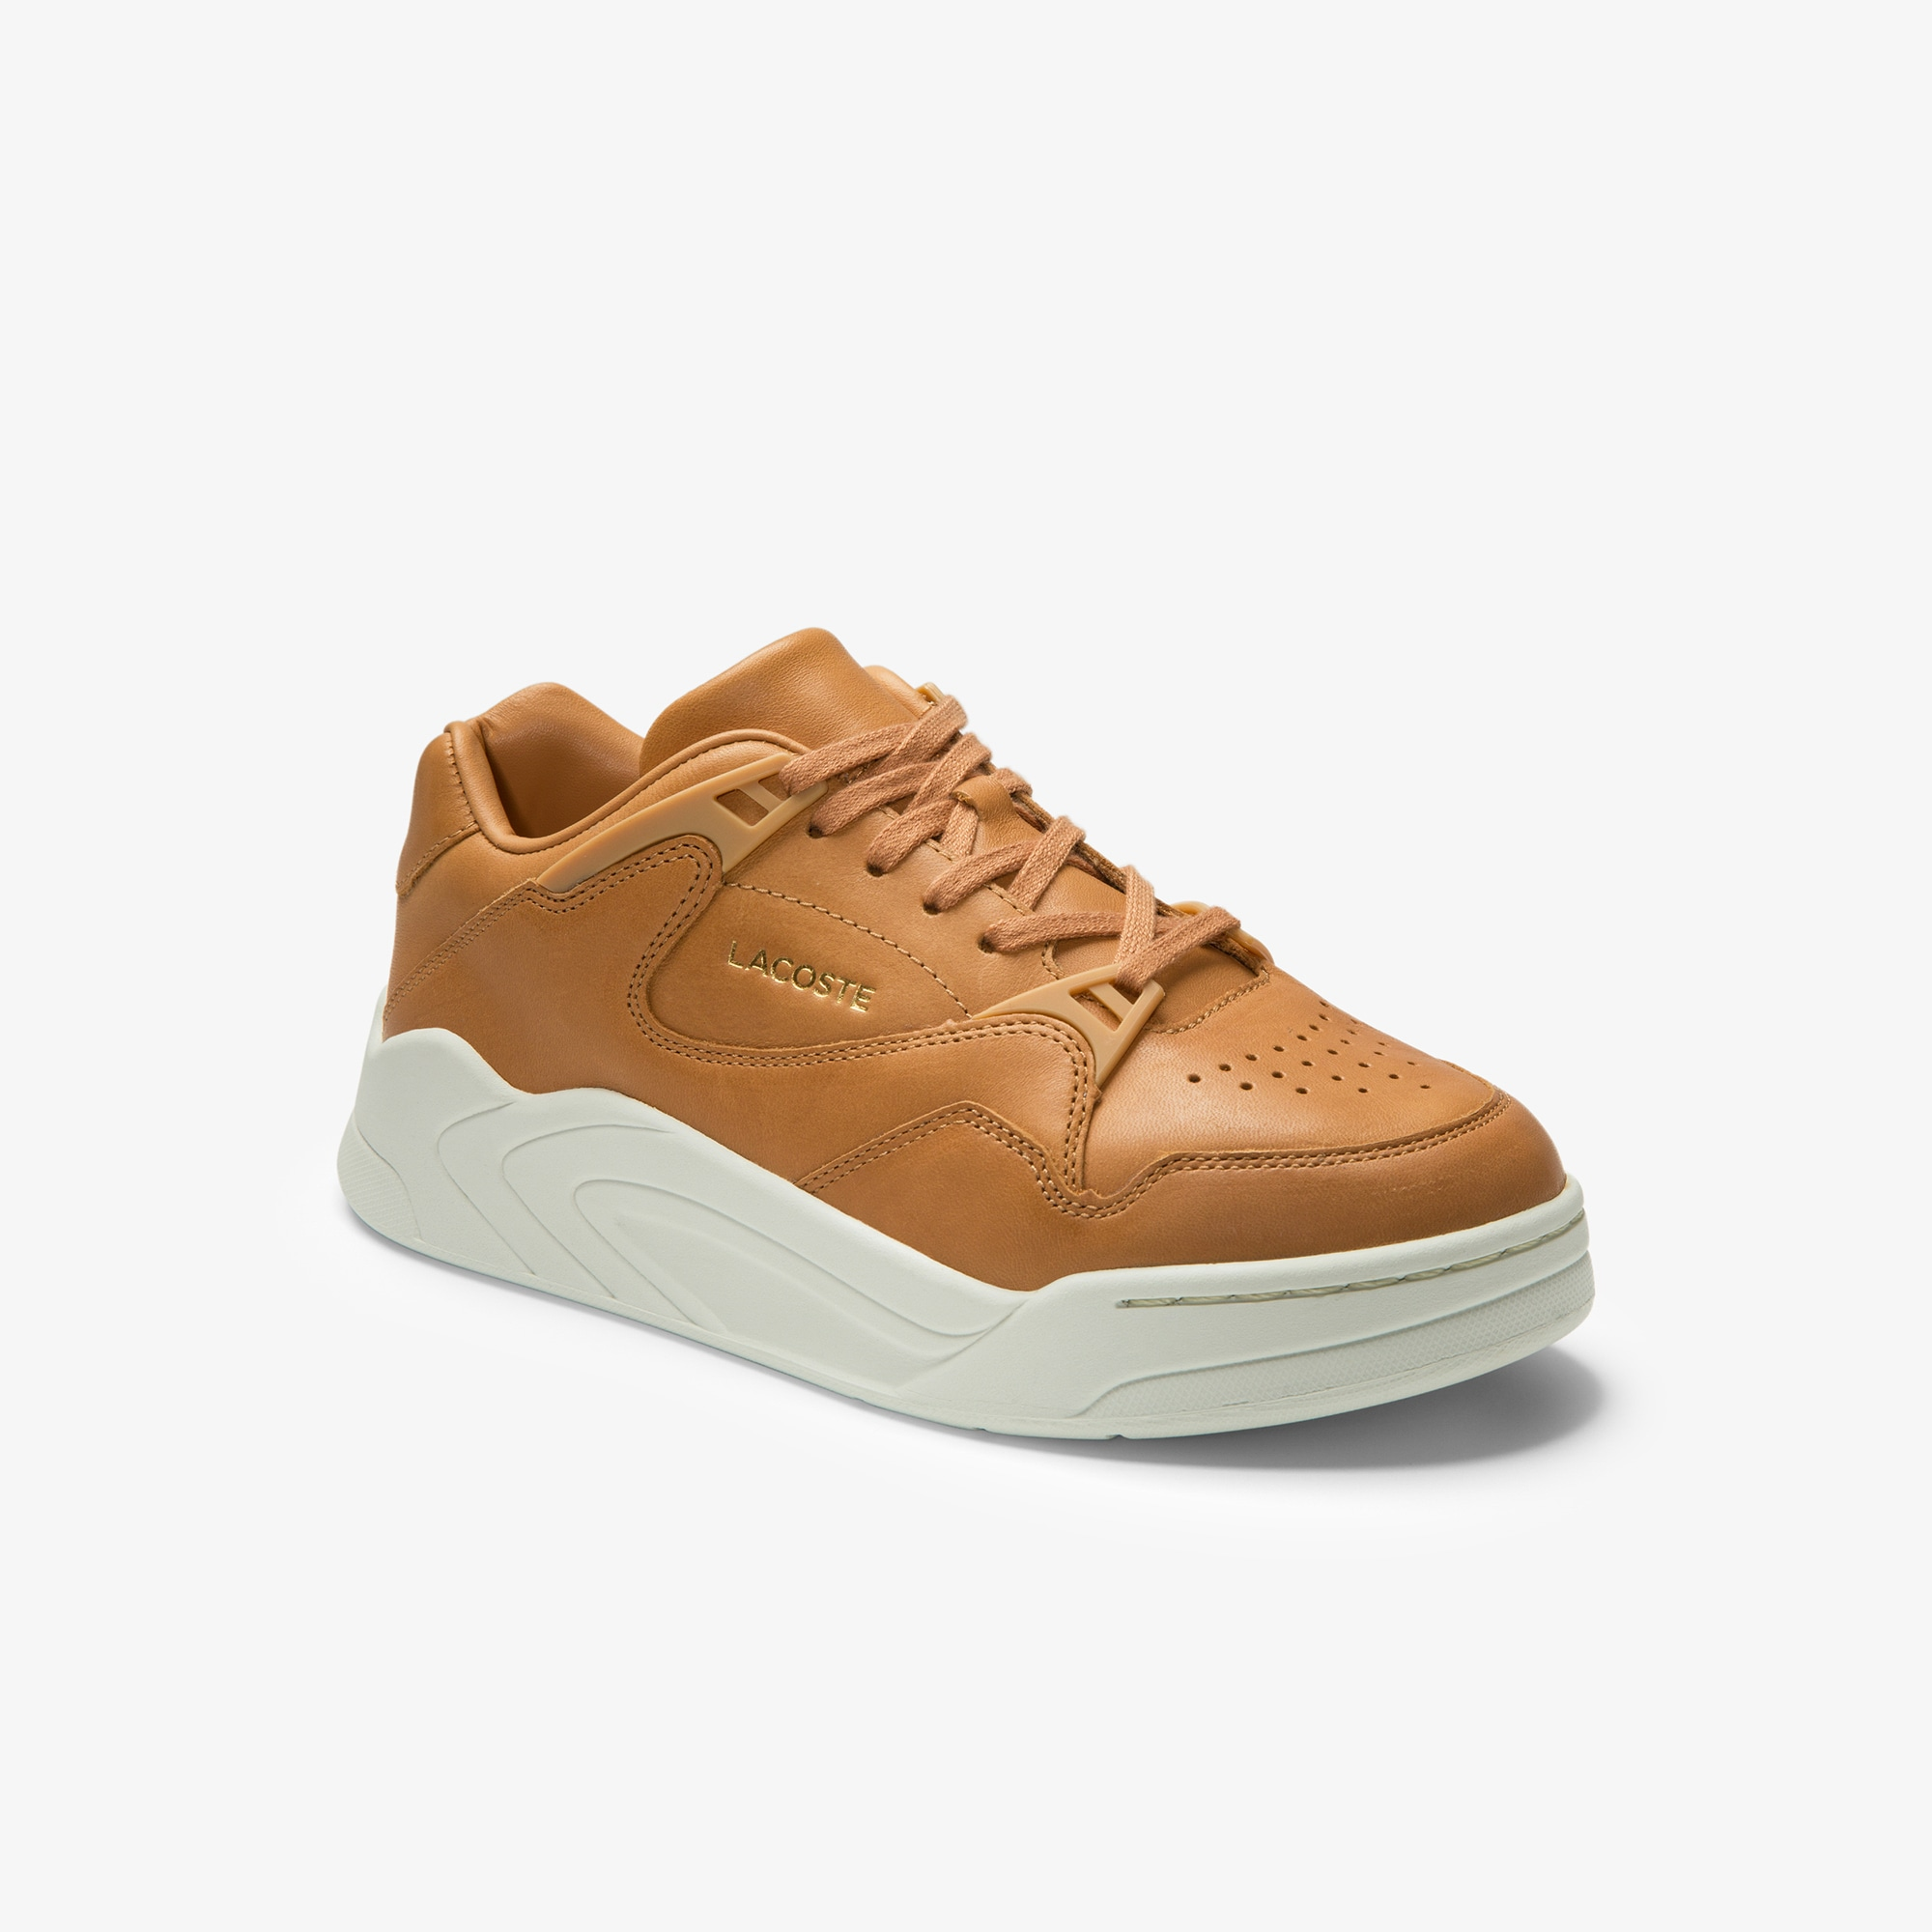 Lacoste Womens Court Slam Sneakers